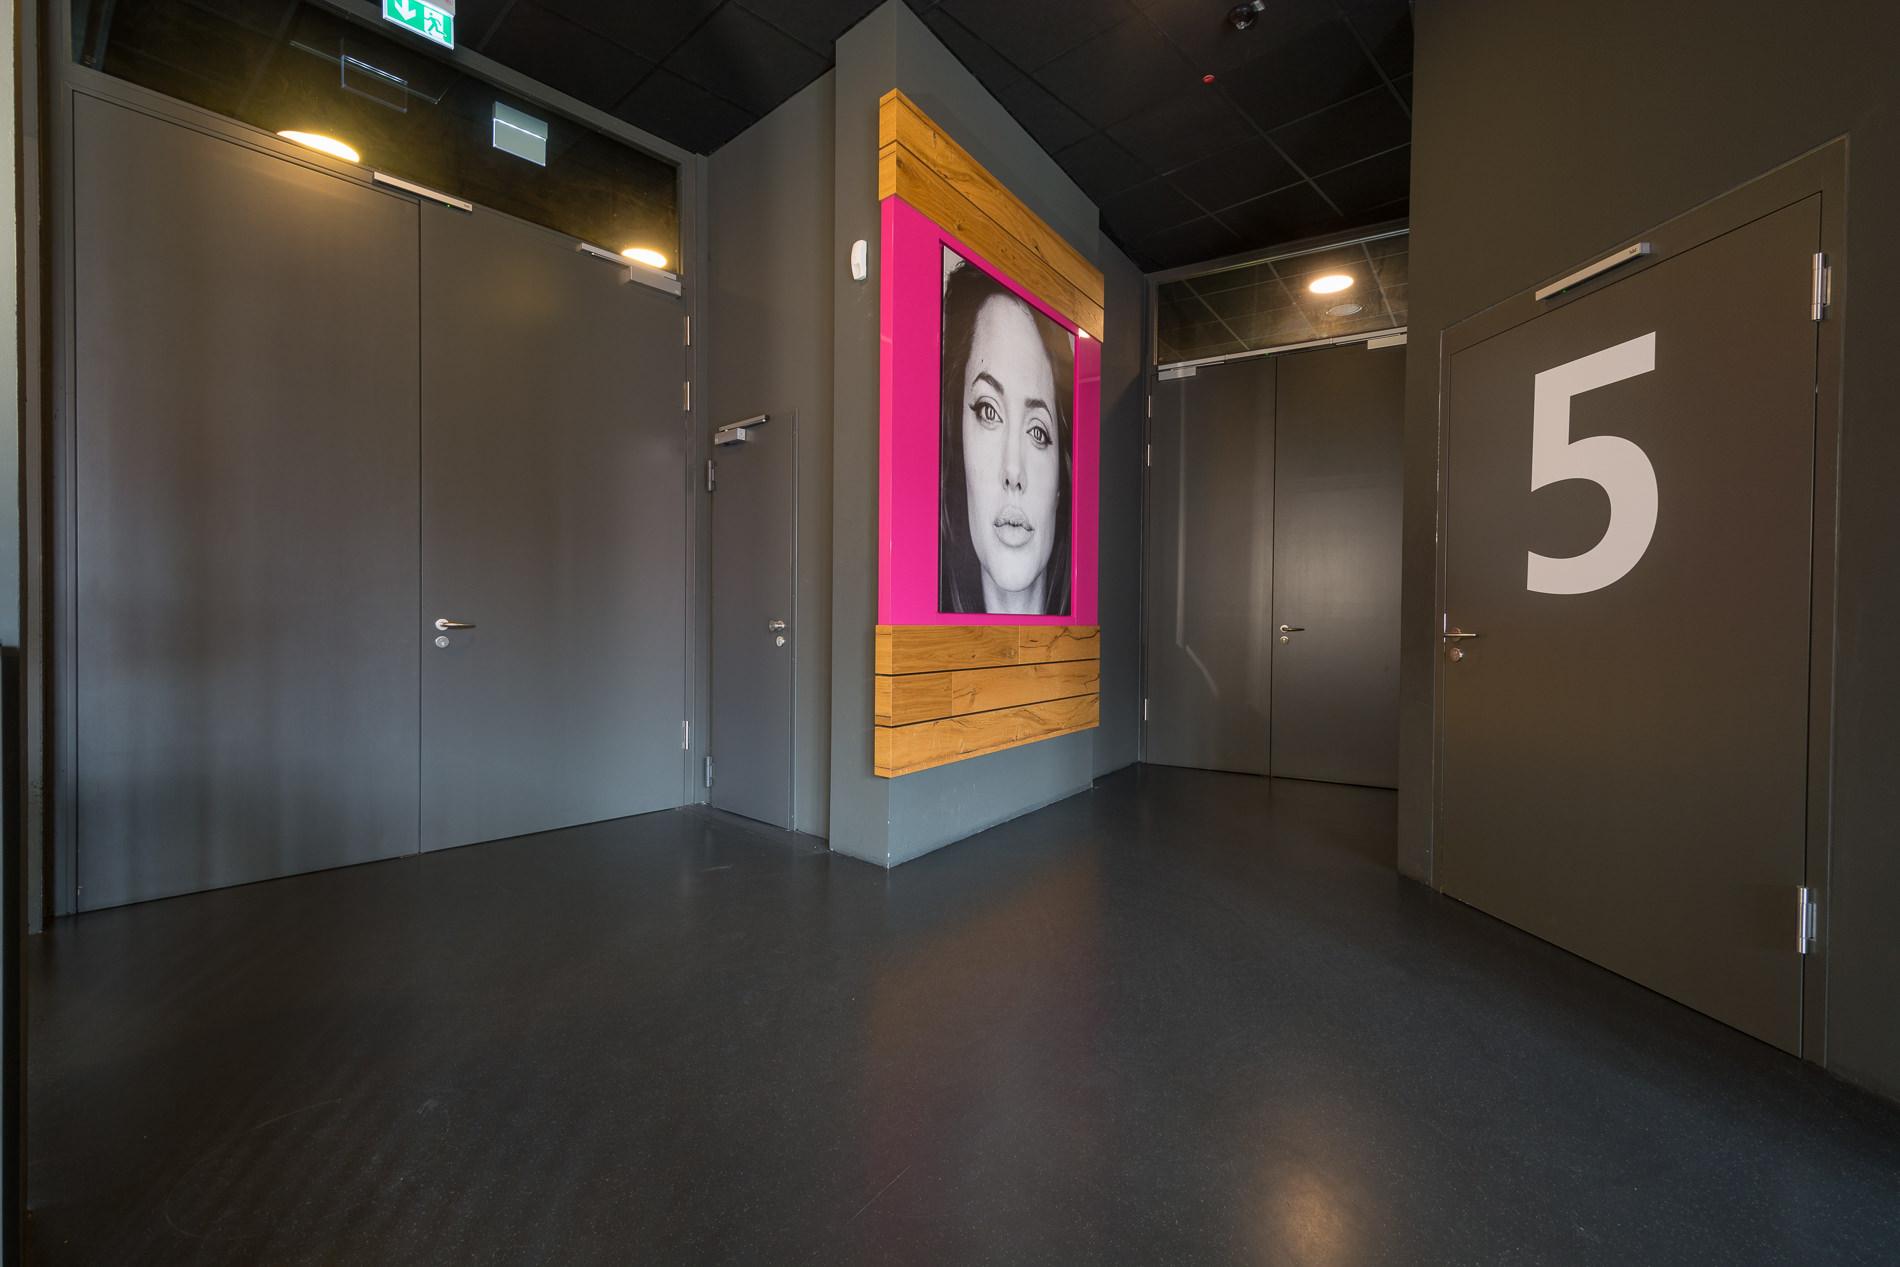 Kino Forum Lahr Programm